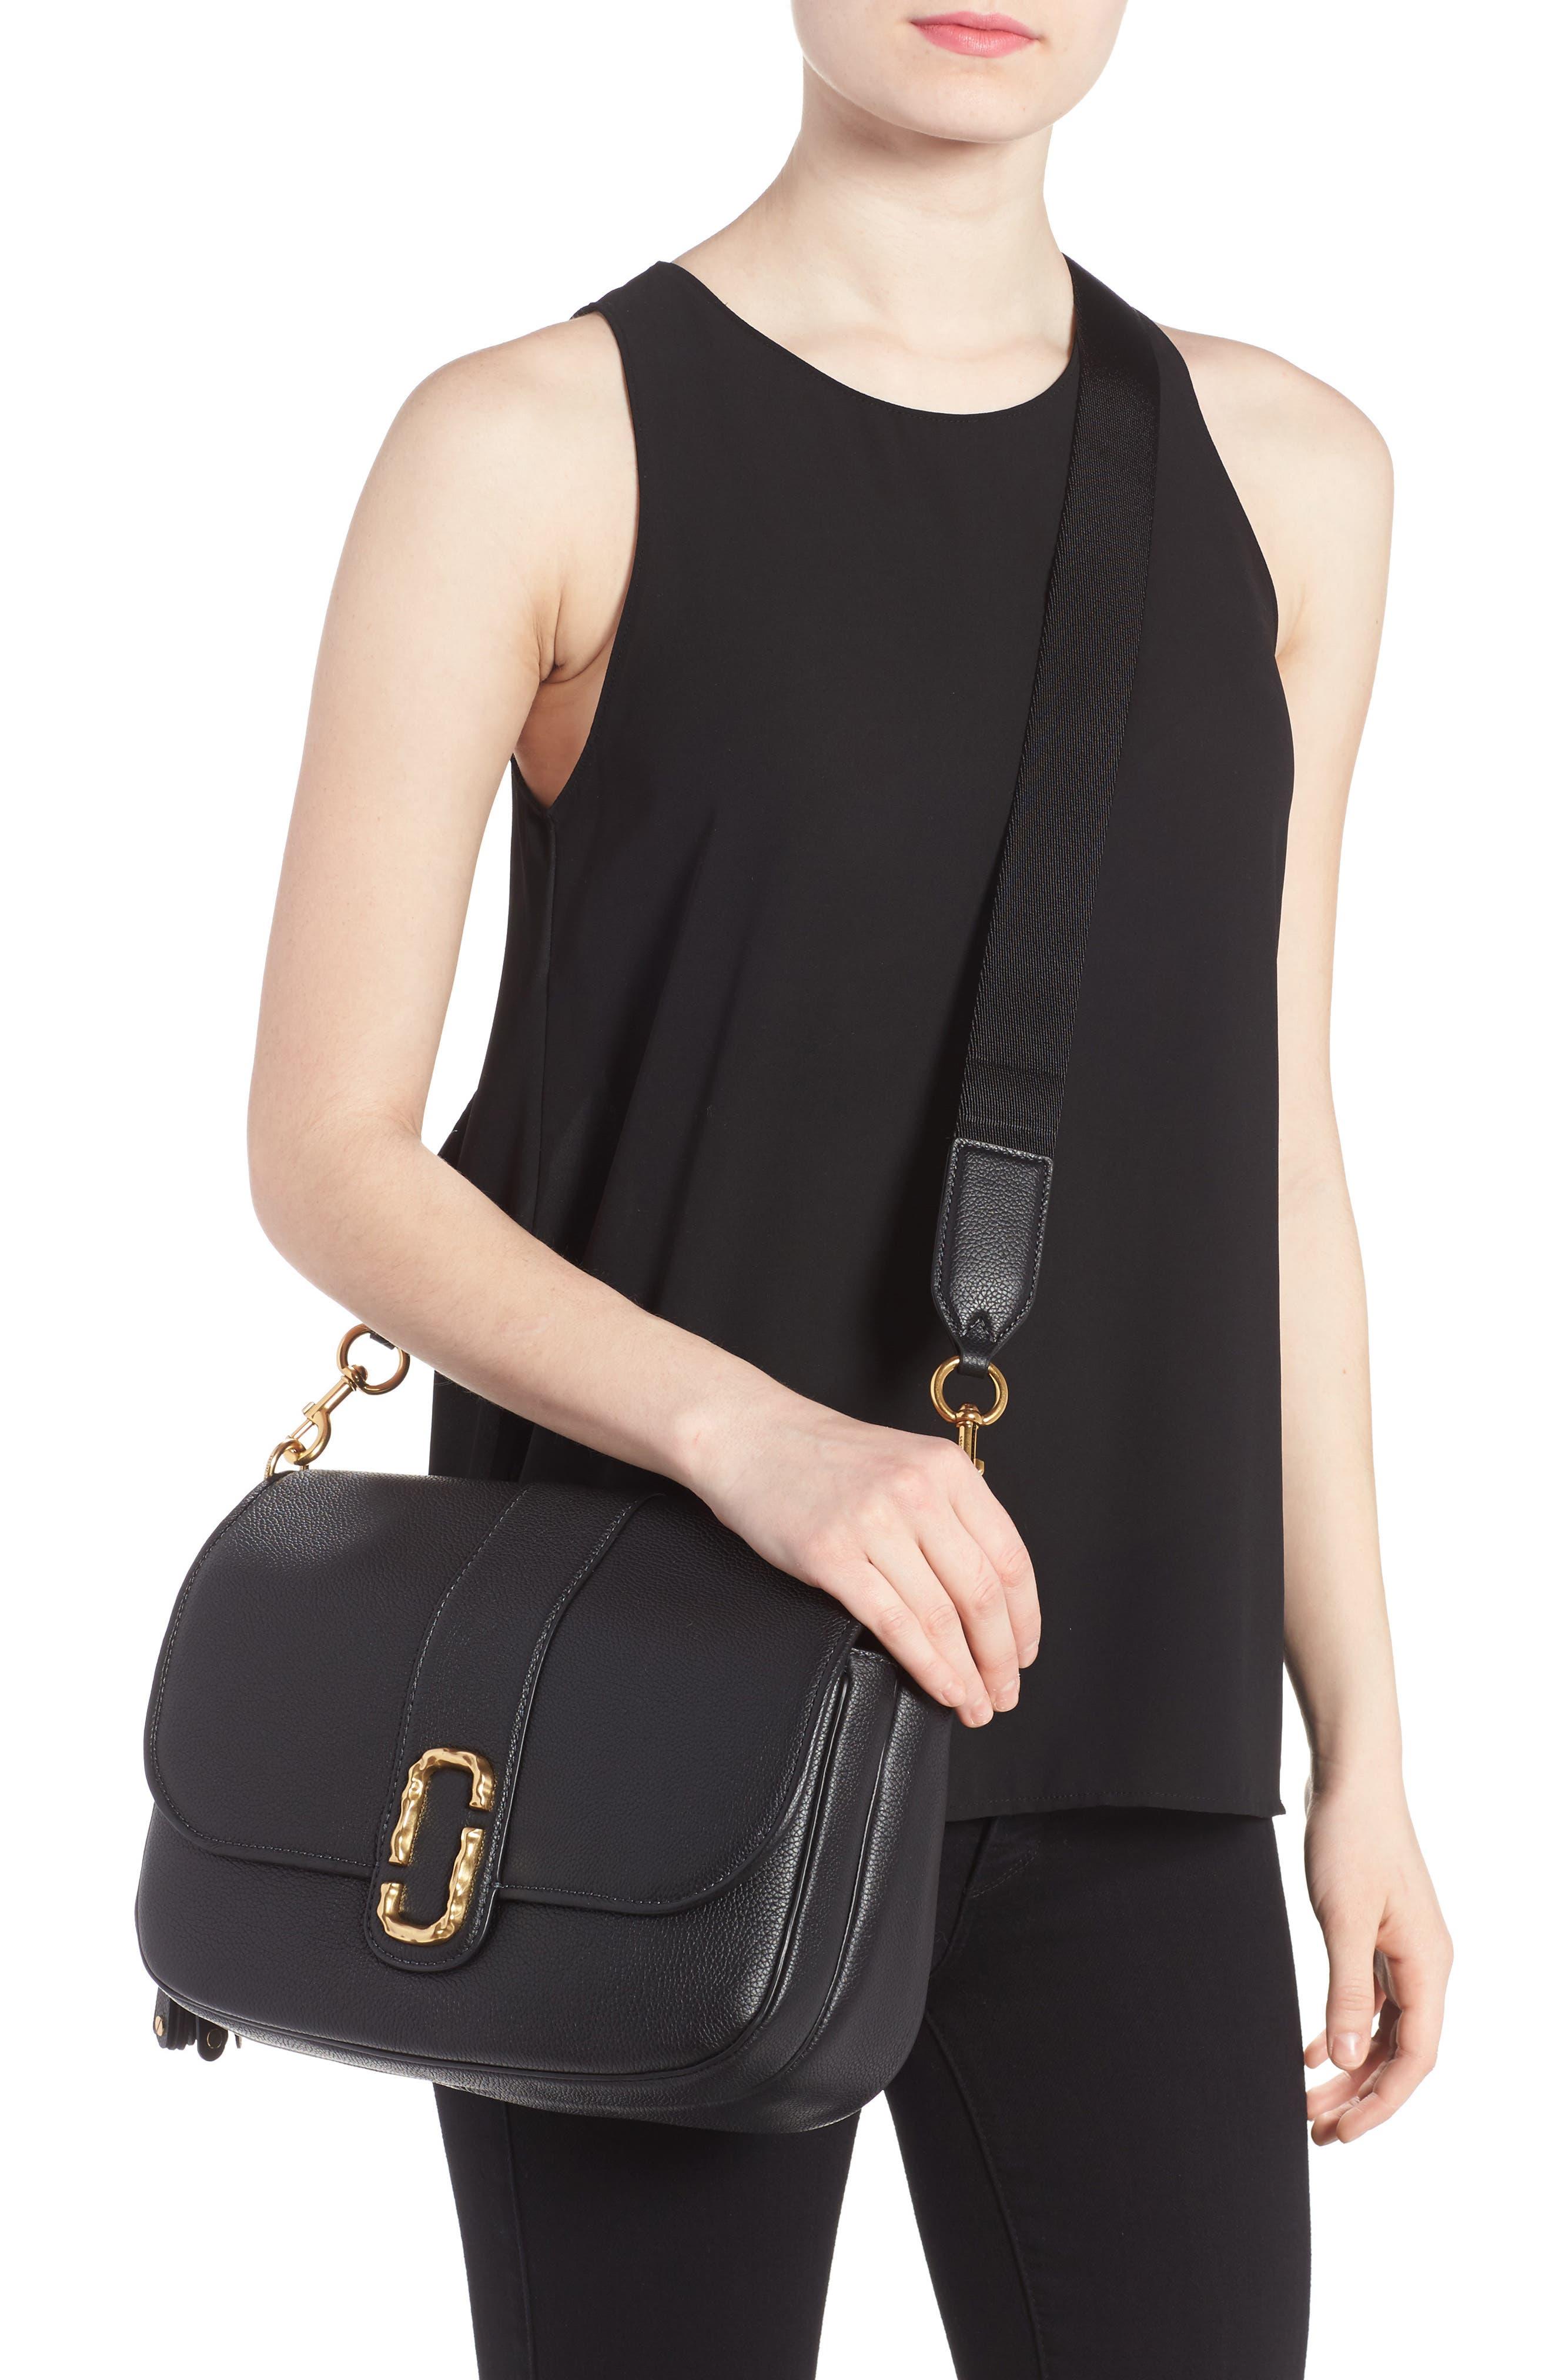 Interlock Leather Crossbody Bag,                             Alternate thumbnail 2, color,                             001